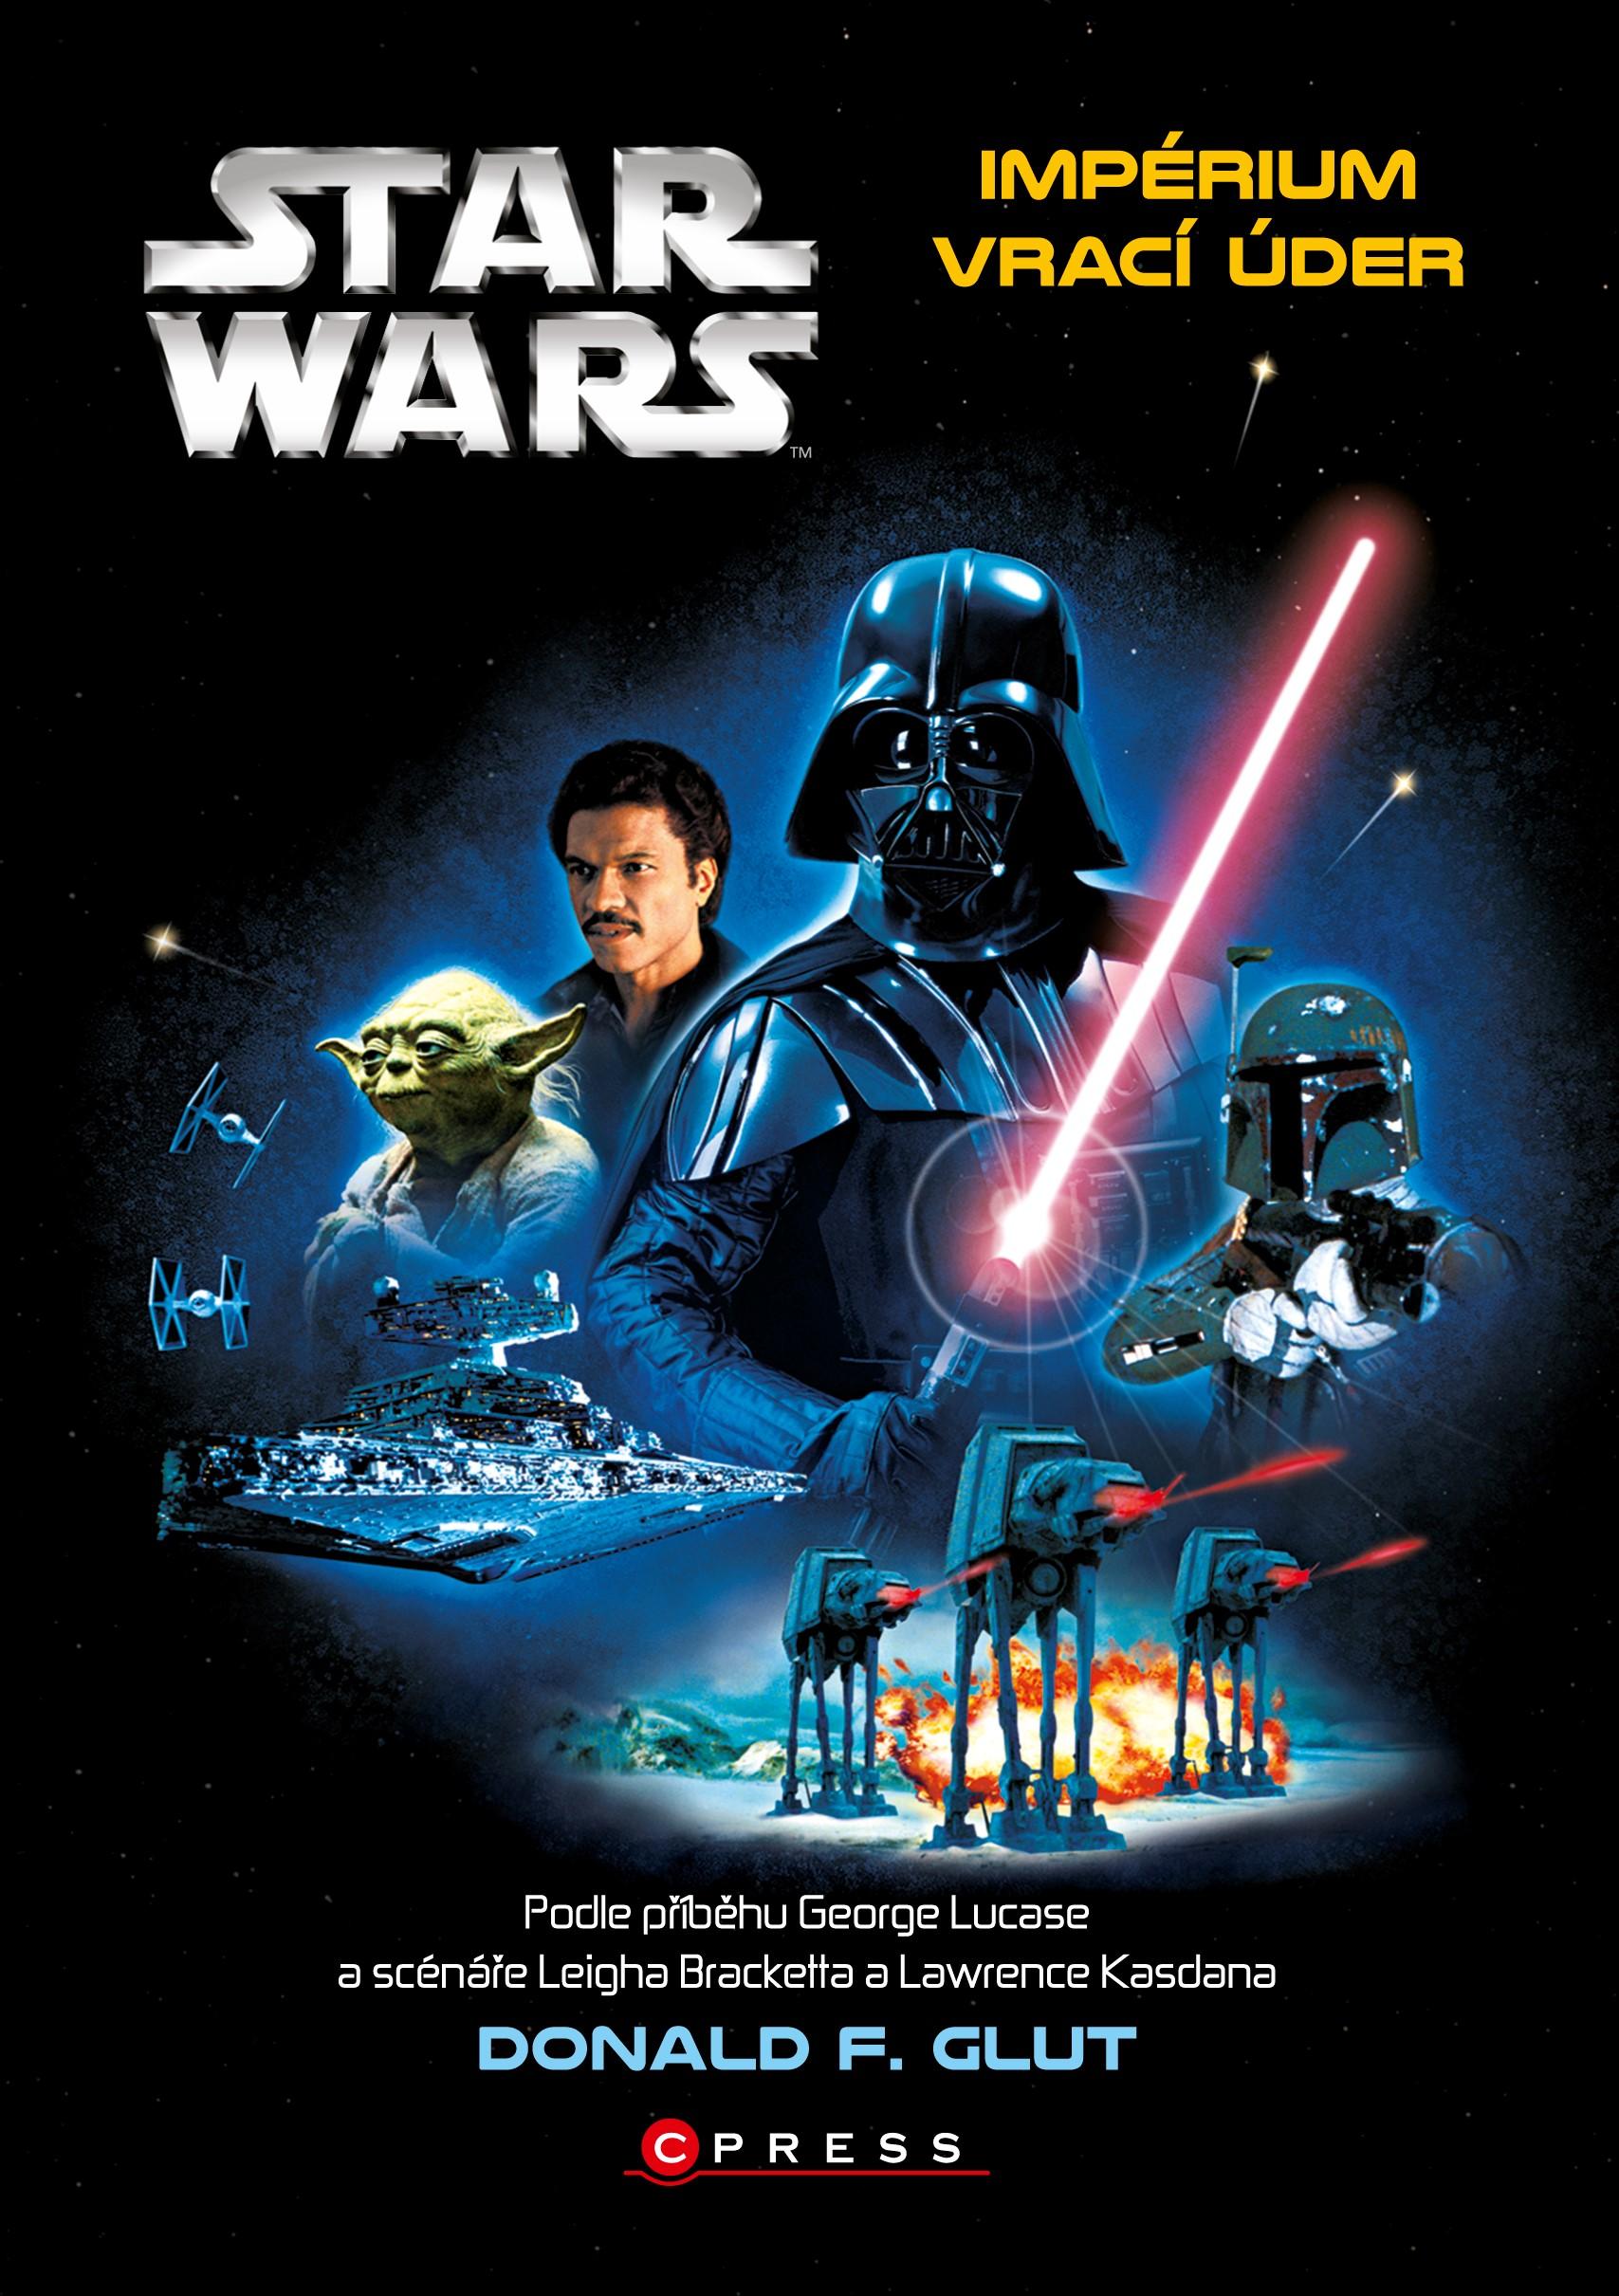 Star Wars: Impérium vrací úder | Donald F. Glut, George Lucas